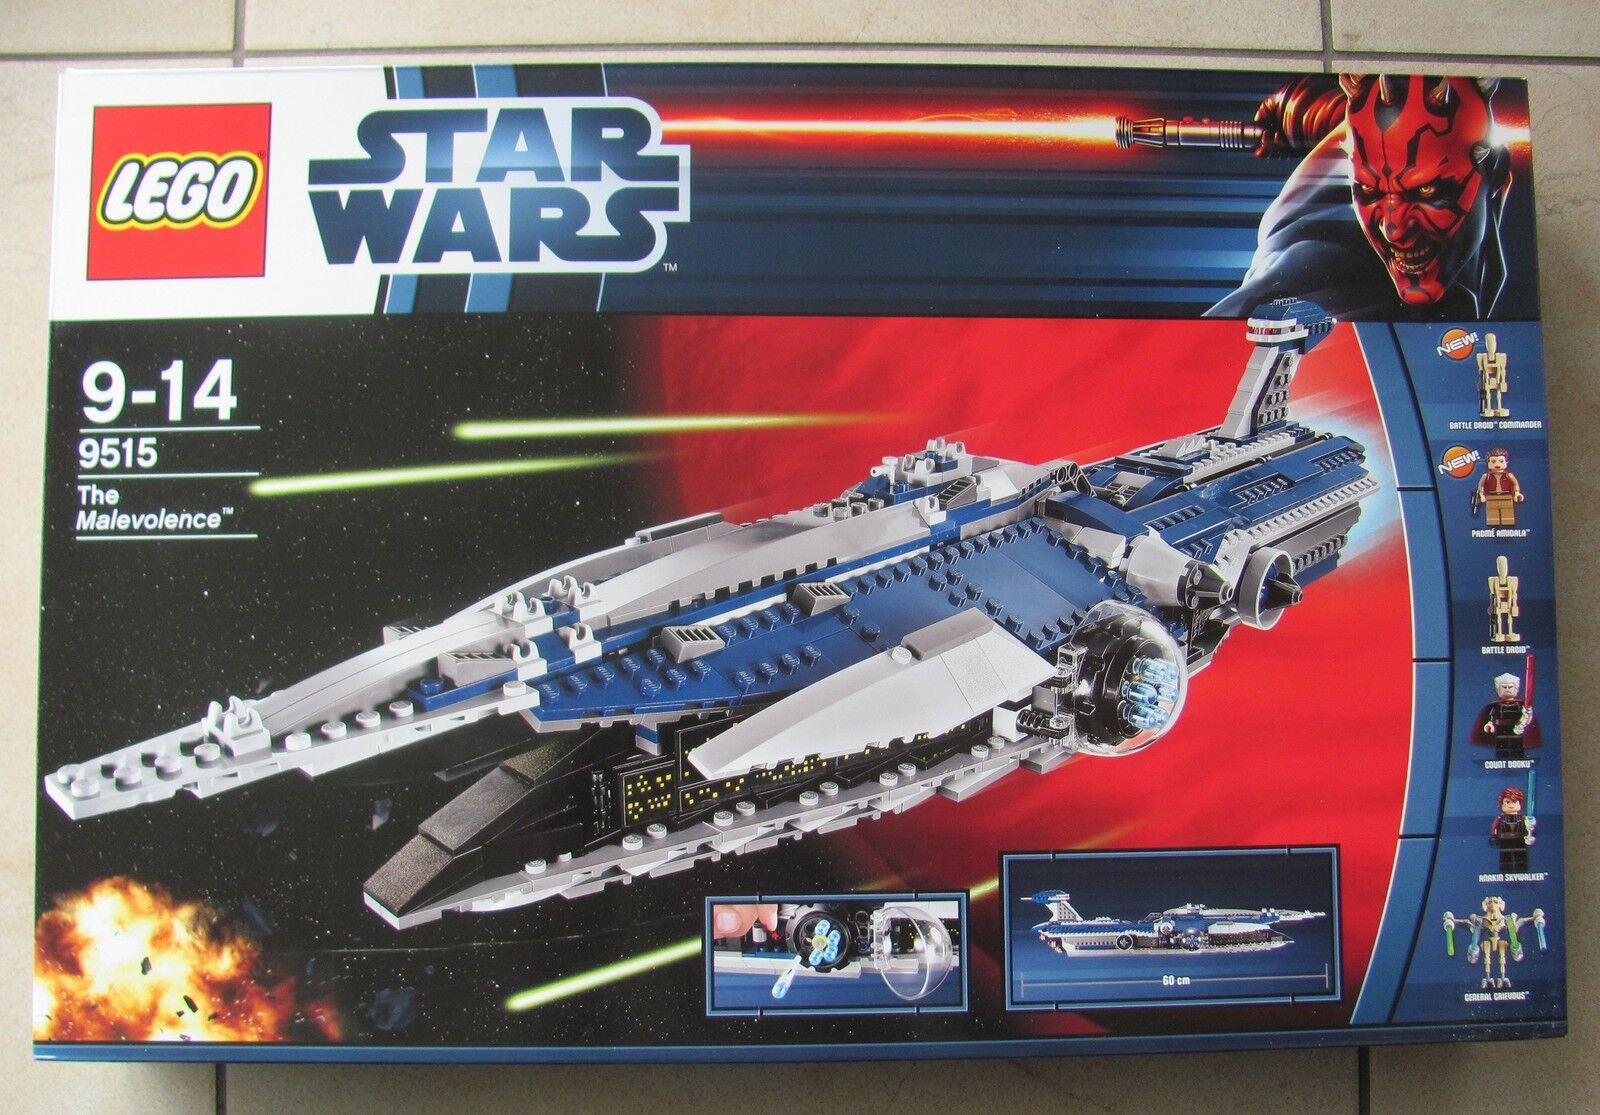 Lego Star Wars 9515 Malevolence 2012 nuevo & OVP rareza